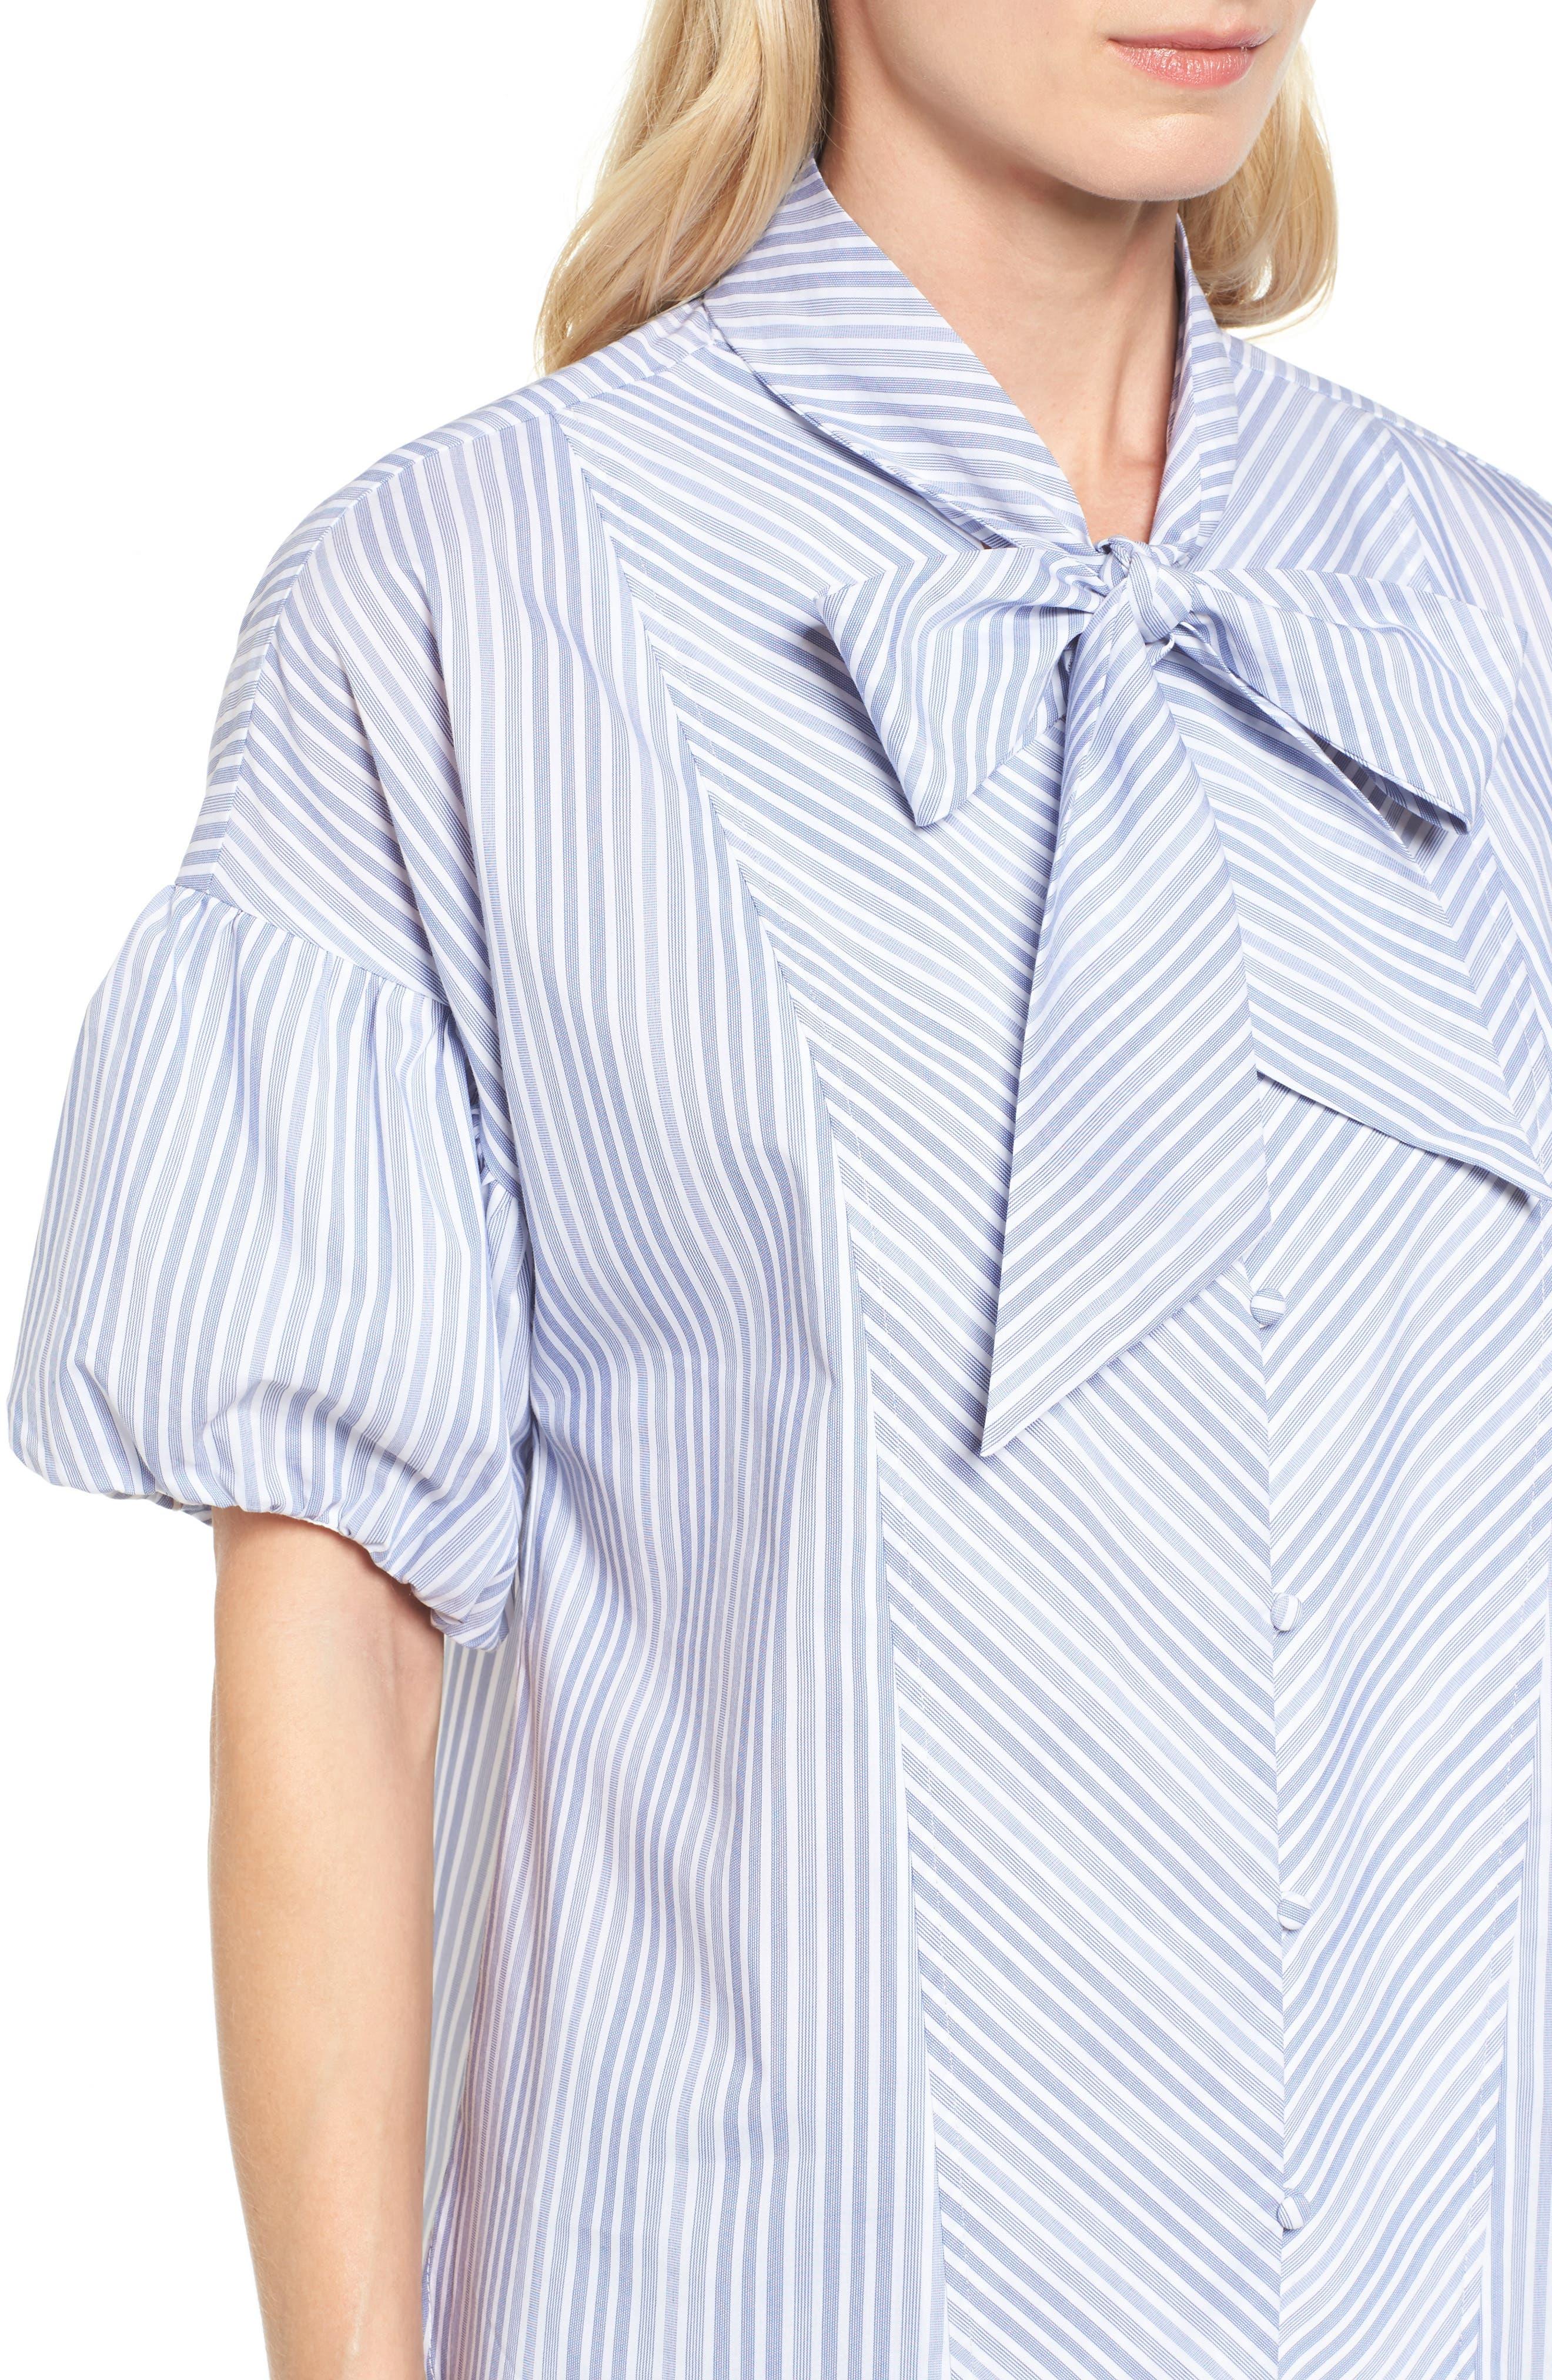 Tie Front Short Sleeve Blouse,                             Alternate thumbnail 5, color,                             Blue- White Stripe